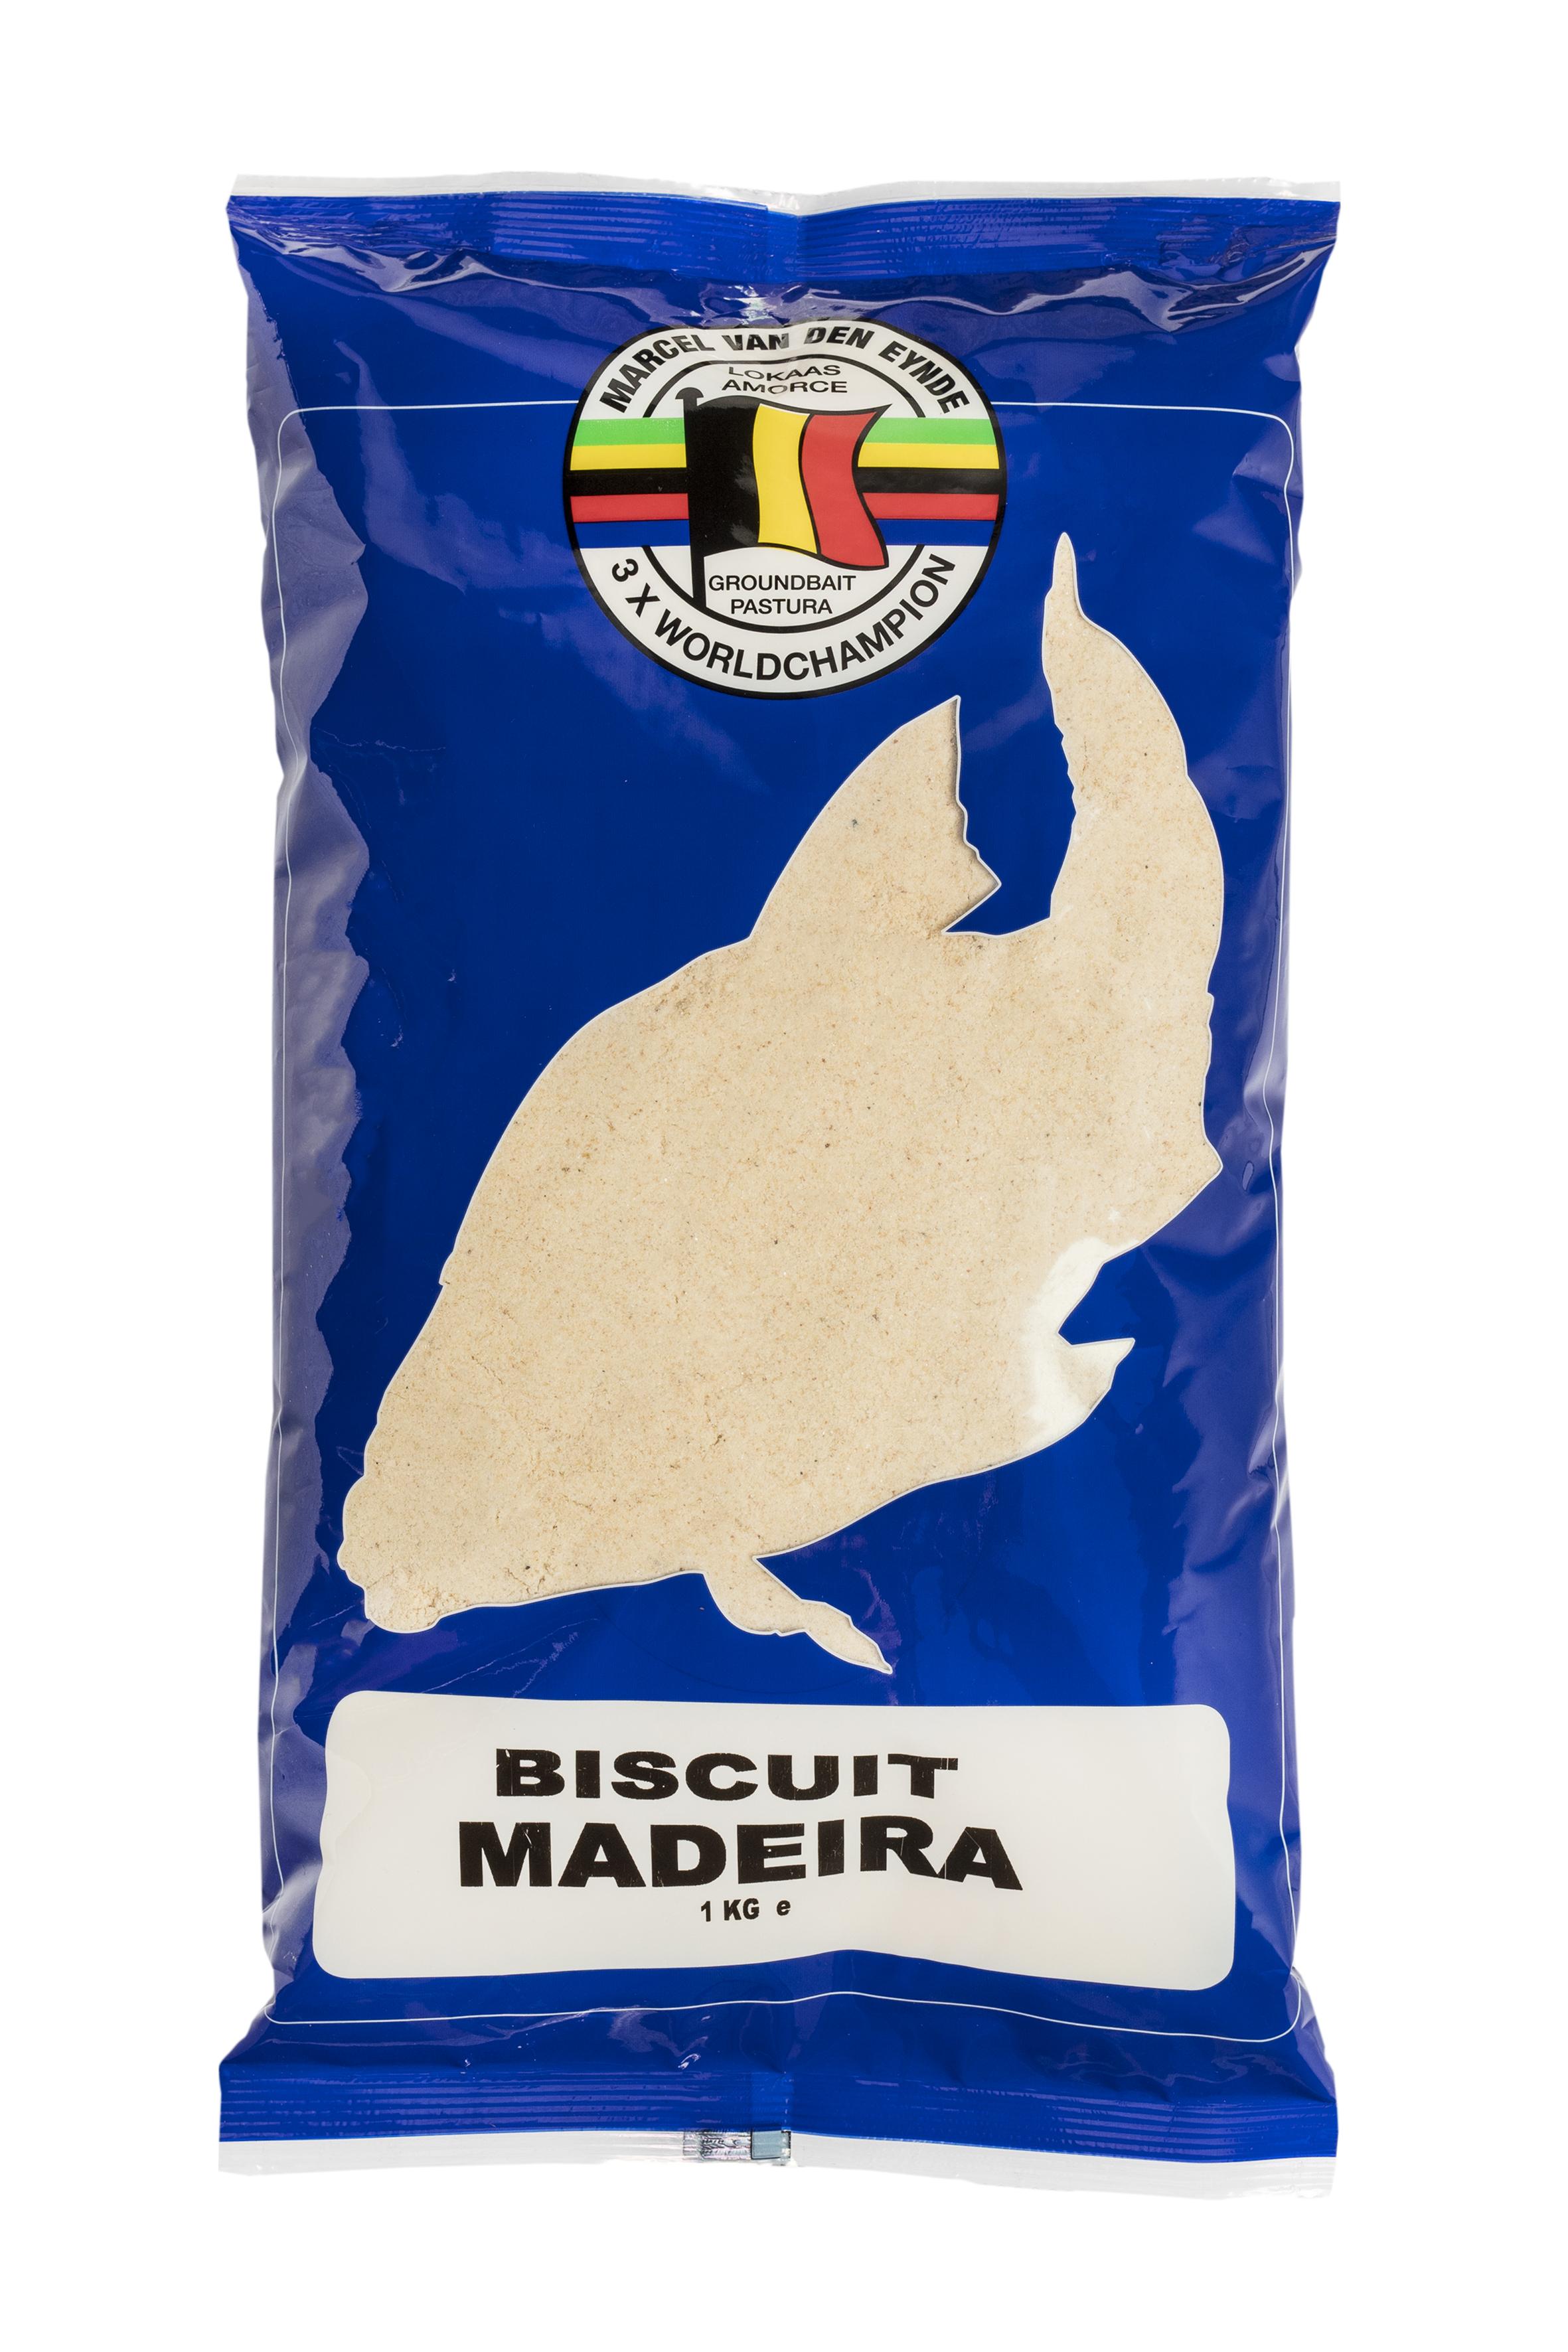 MVDE Biscuit Madeira (sušienky) 1kg